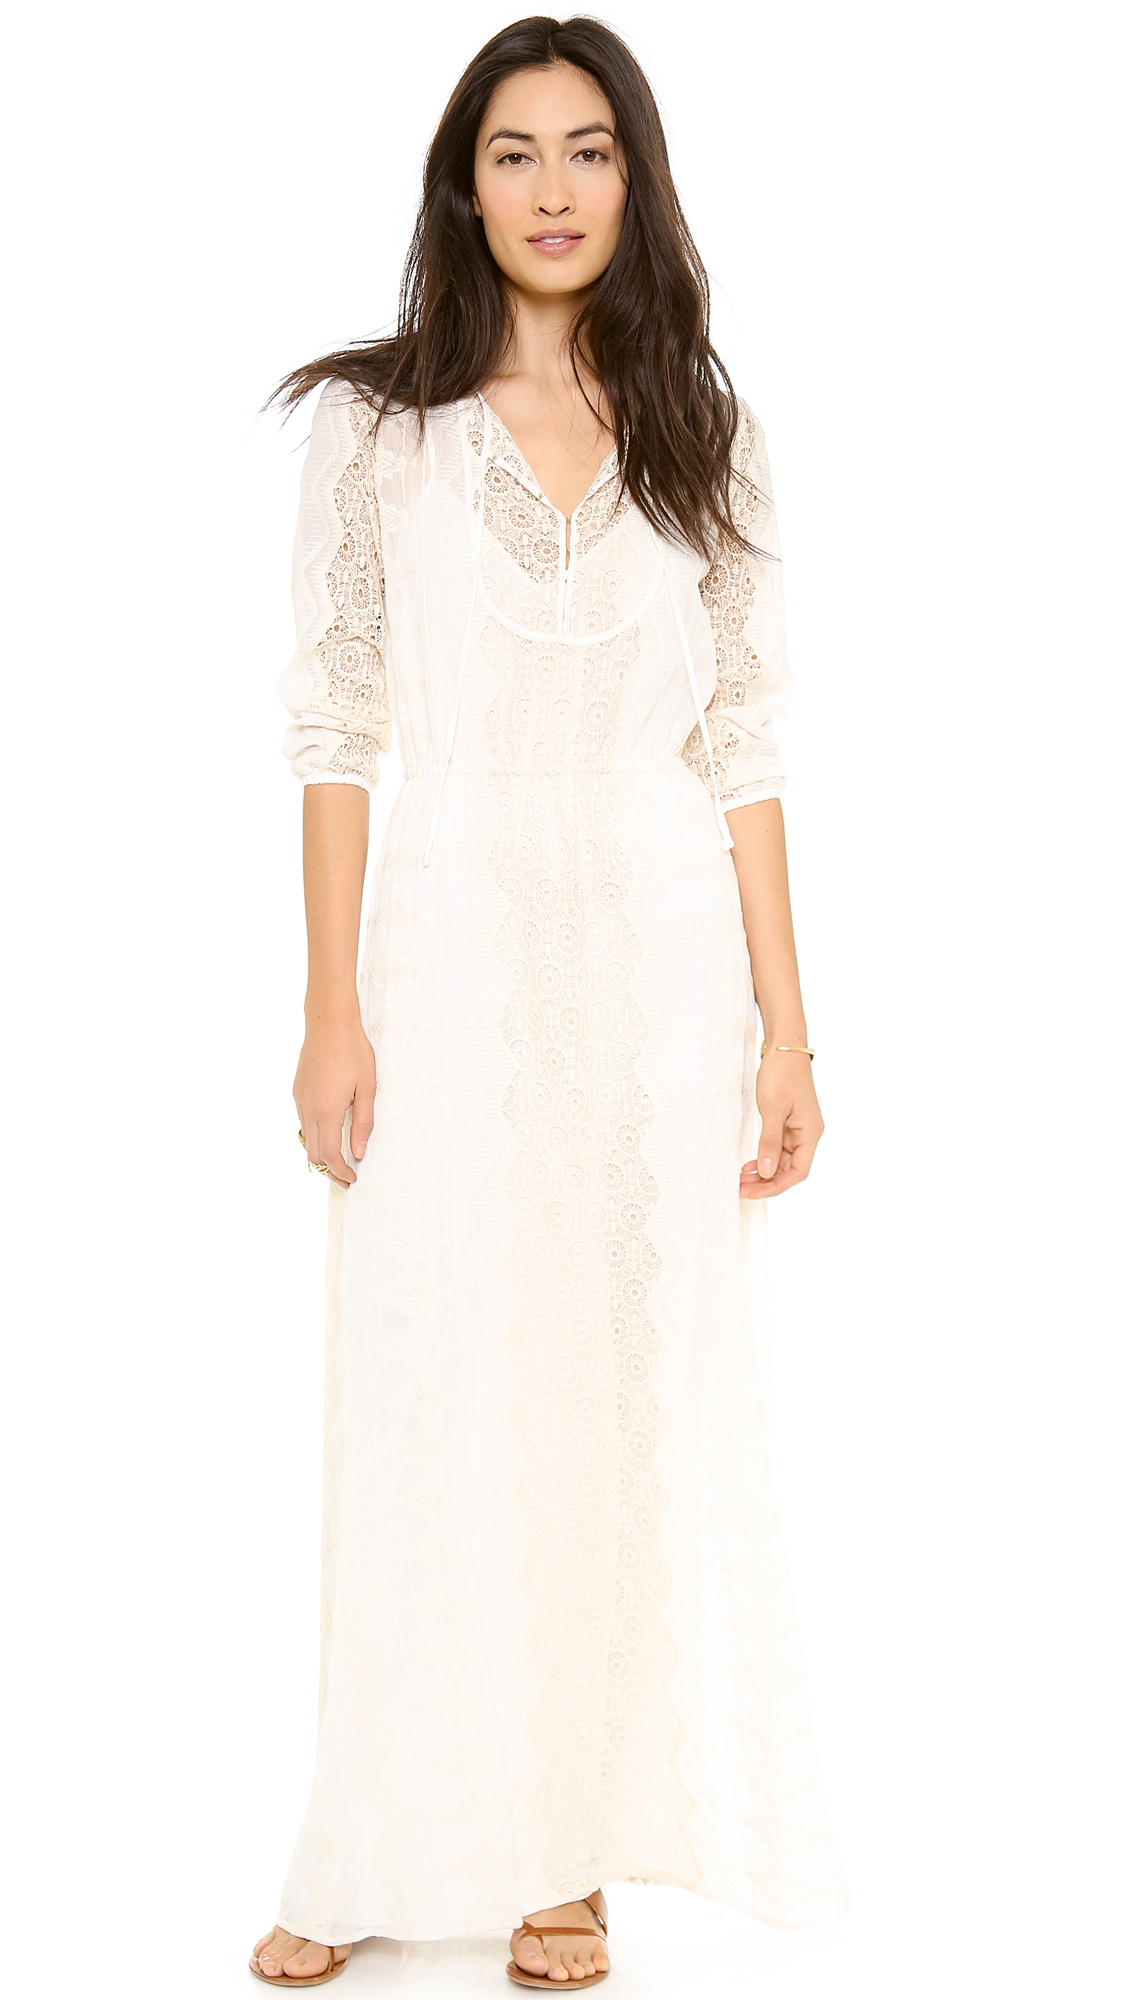 Twelfth Street Cynthia Vincent Long Sleeve Maxi Dress in ...